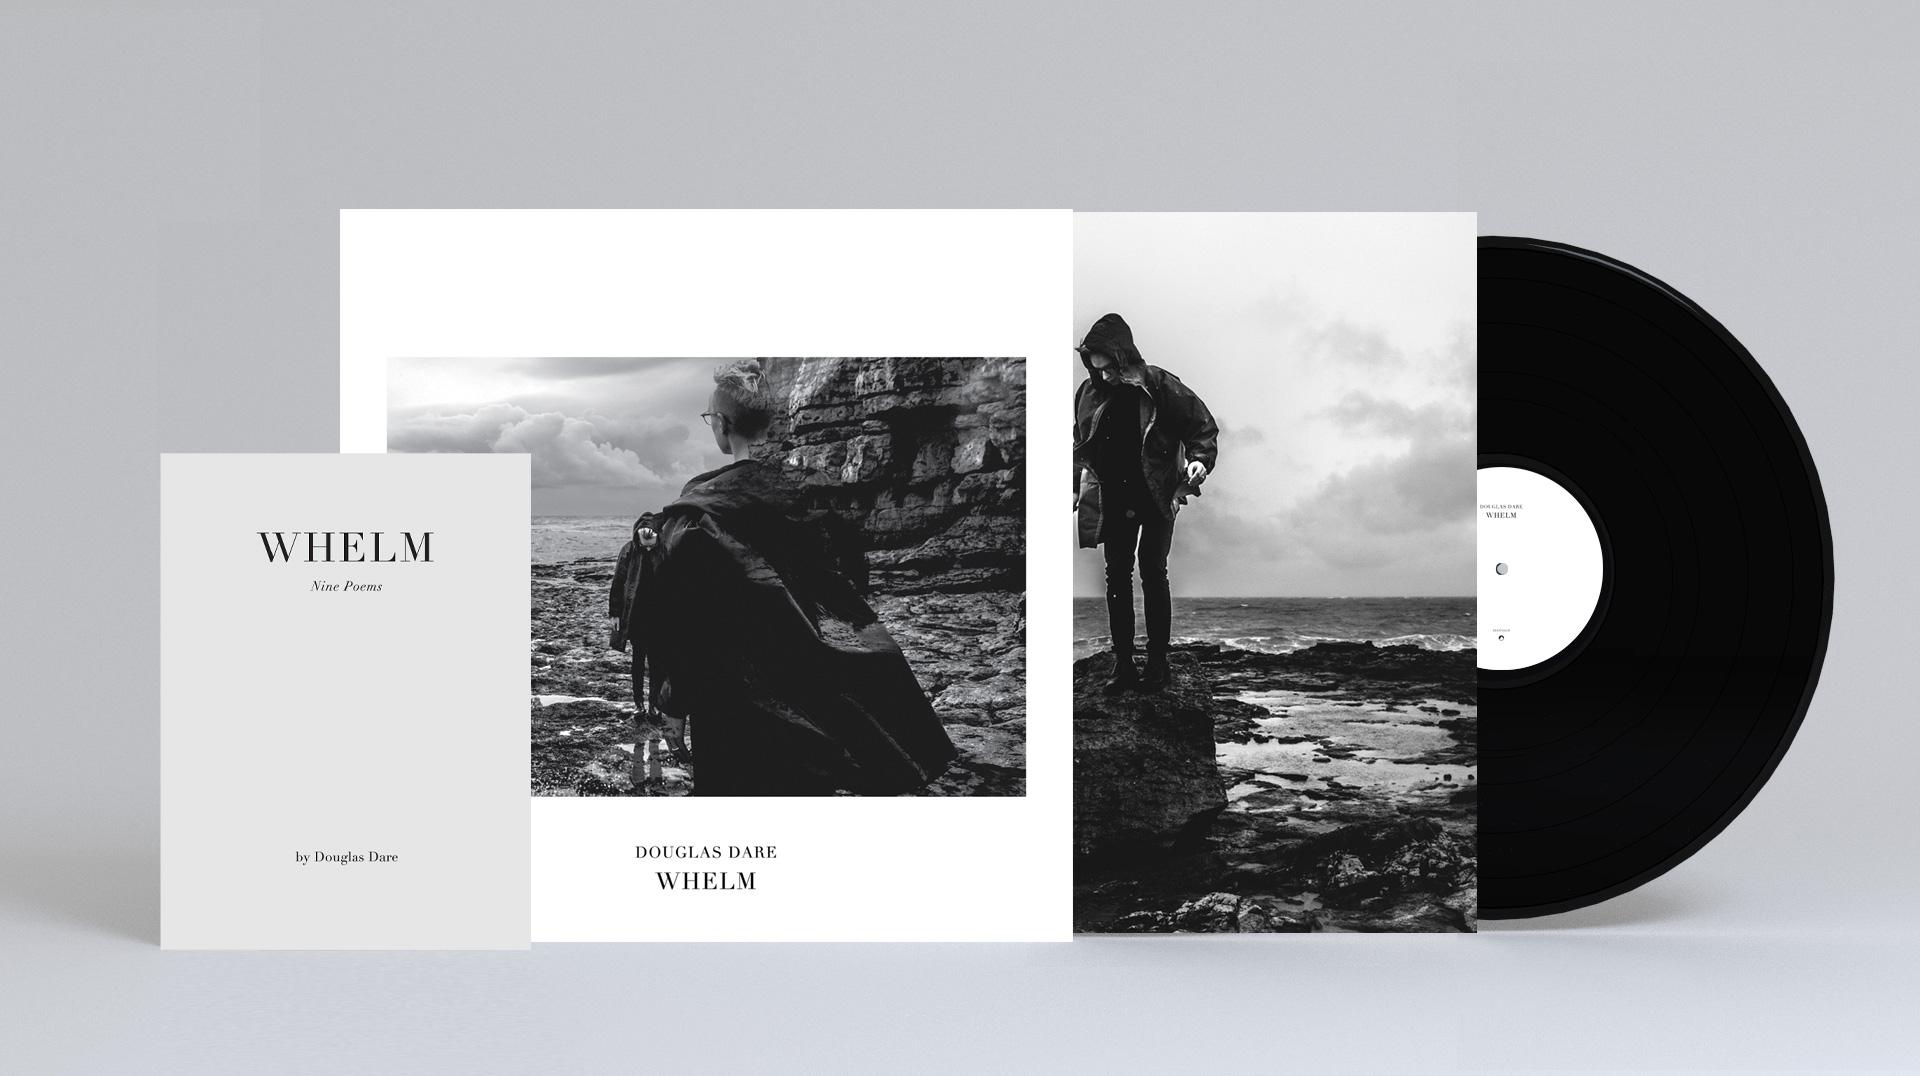 CD Pre-review: Whelm by Douglas Dare